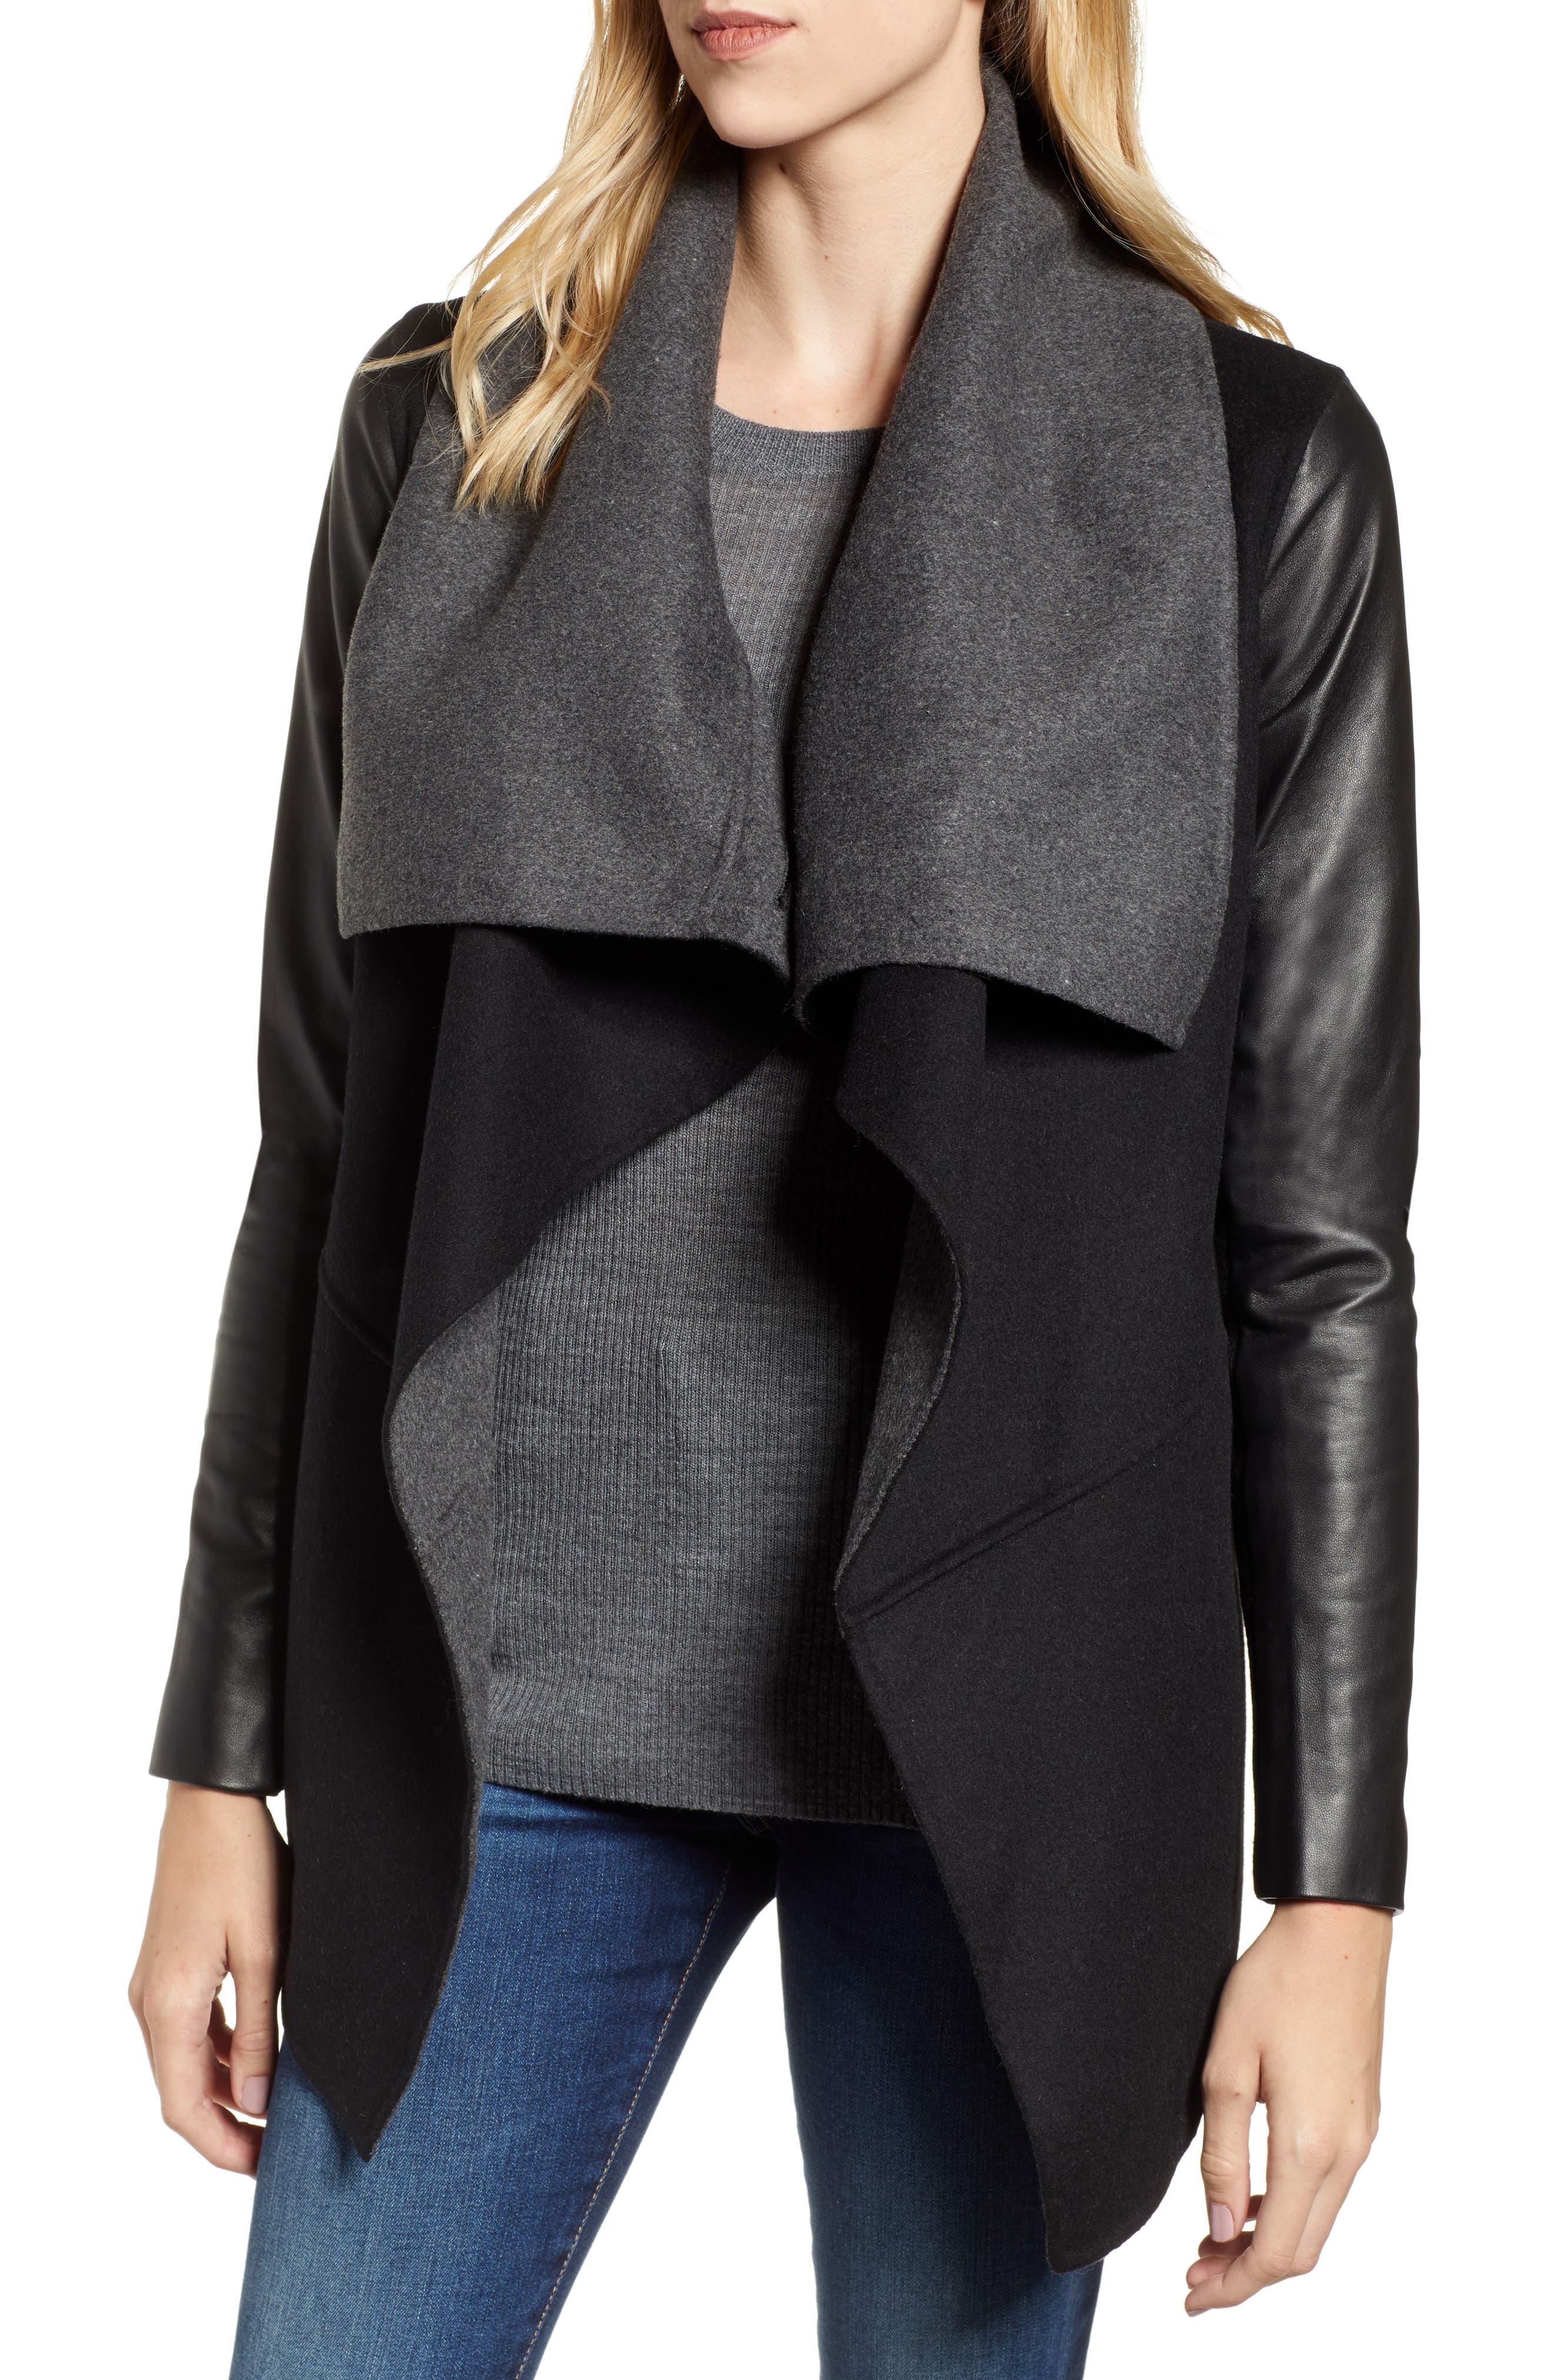 Vane Asymmetrical Leather Sleeve Coat,                         Main,                         color, BLACK/ CHARCOAL